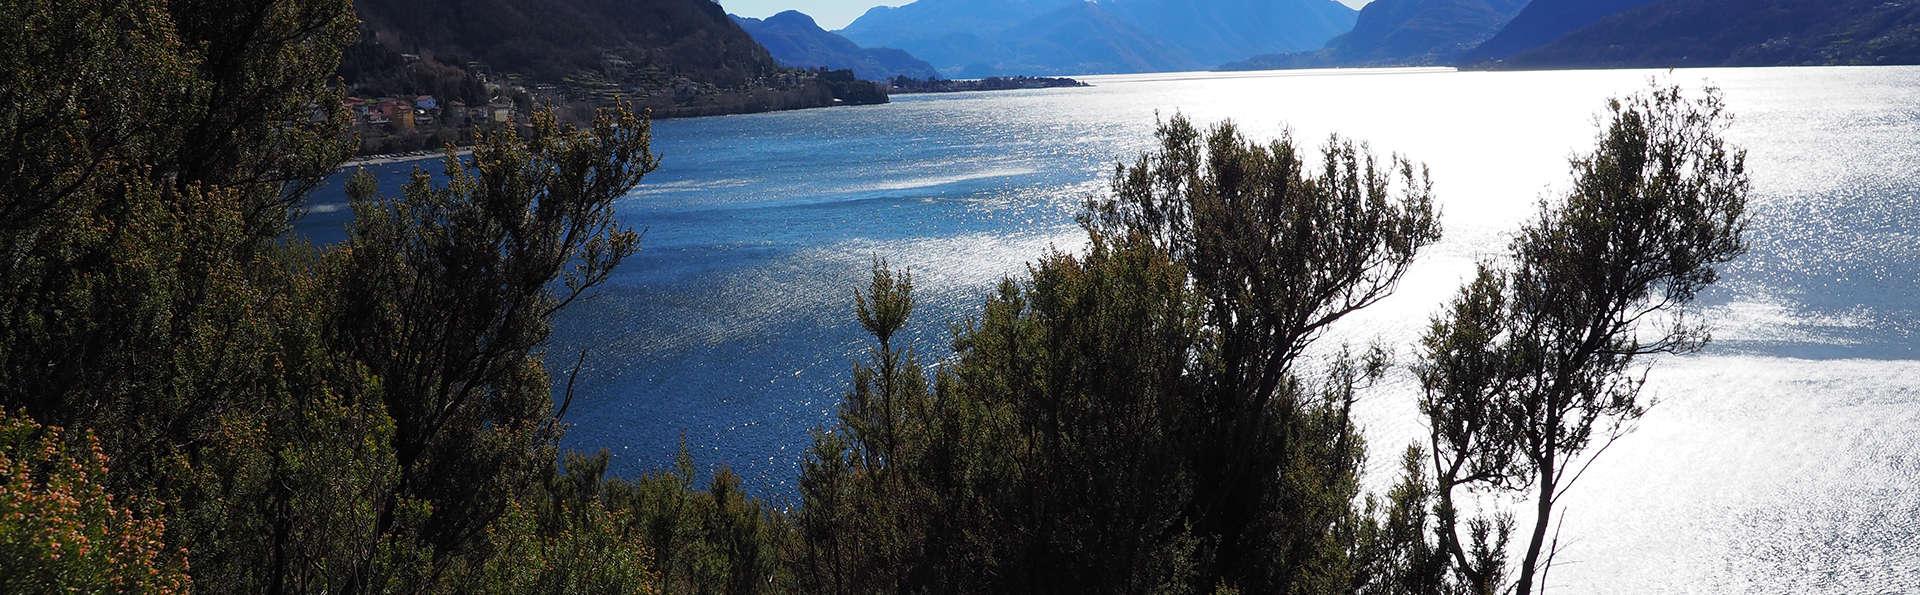 Residence Oasi Dei Celti - Edit_Destination3.jpg